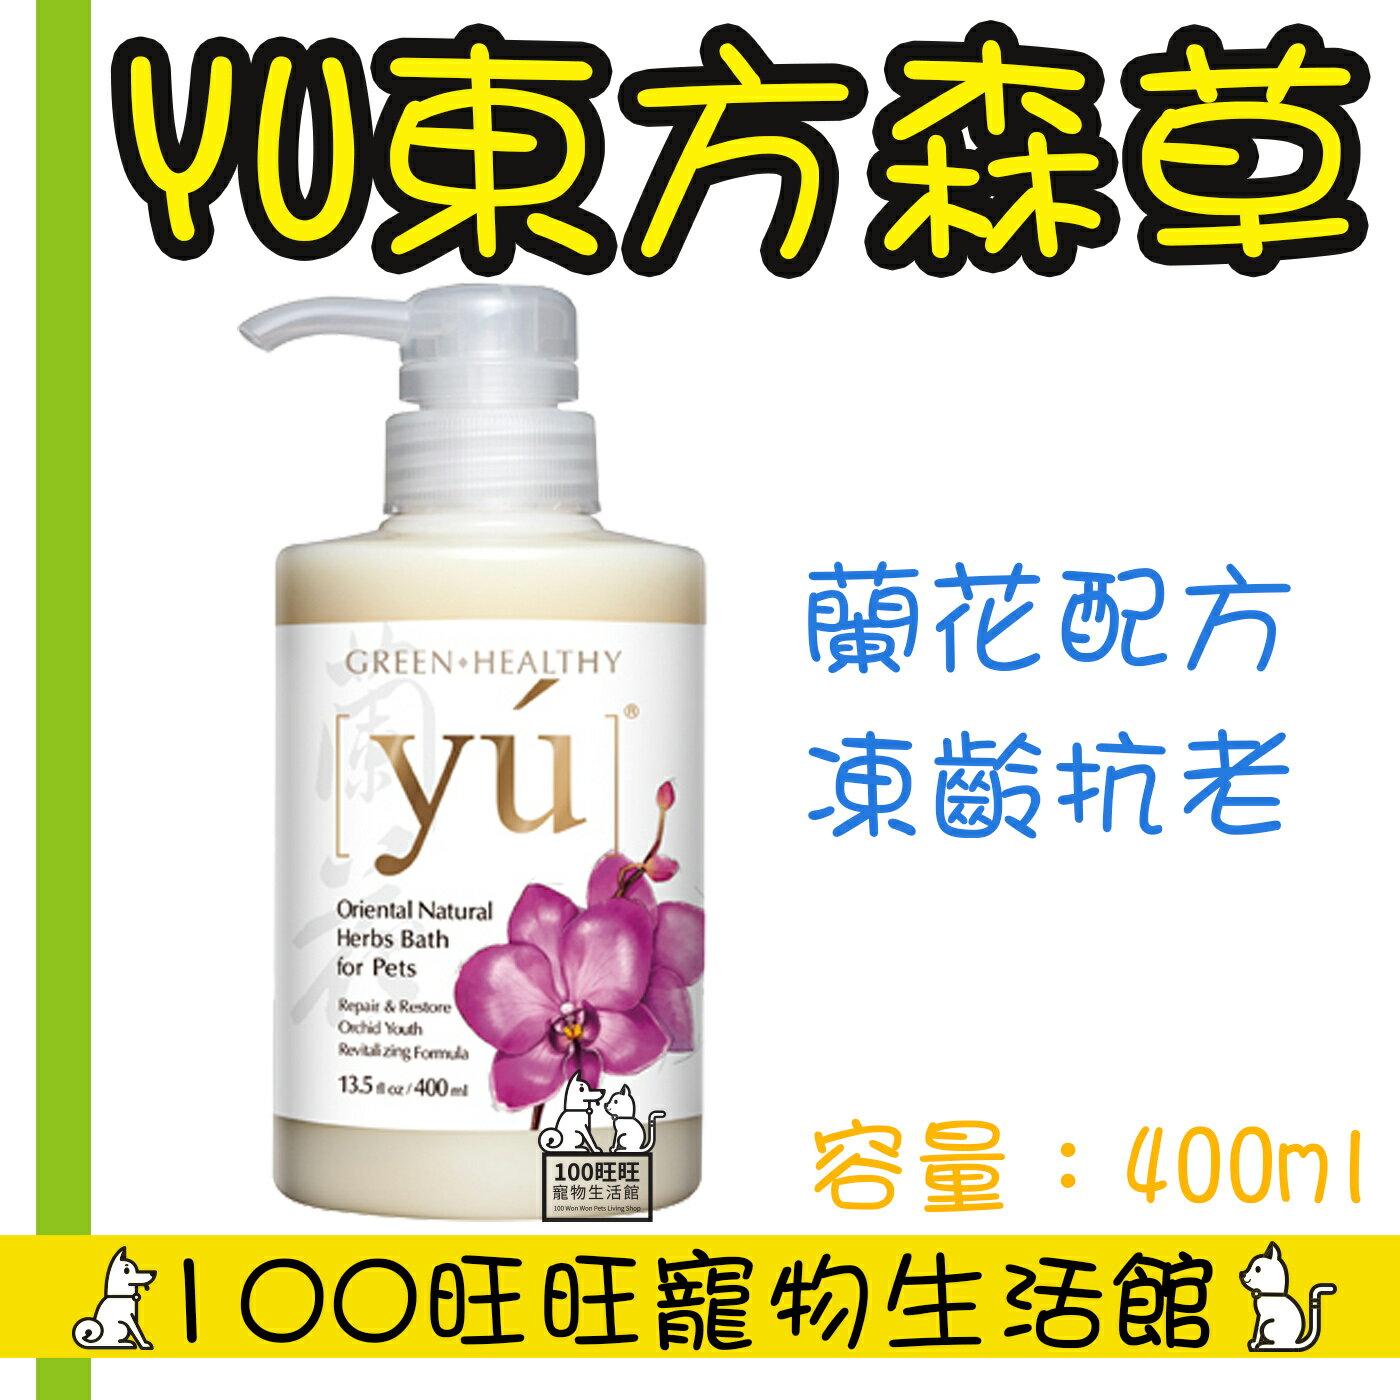 YU 東方森草寵物沐浴乳 有機認證成分 蘭花凍齡抗老配方 400ml 寵物洗毛精